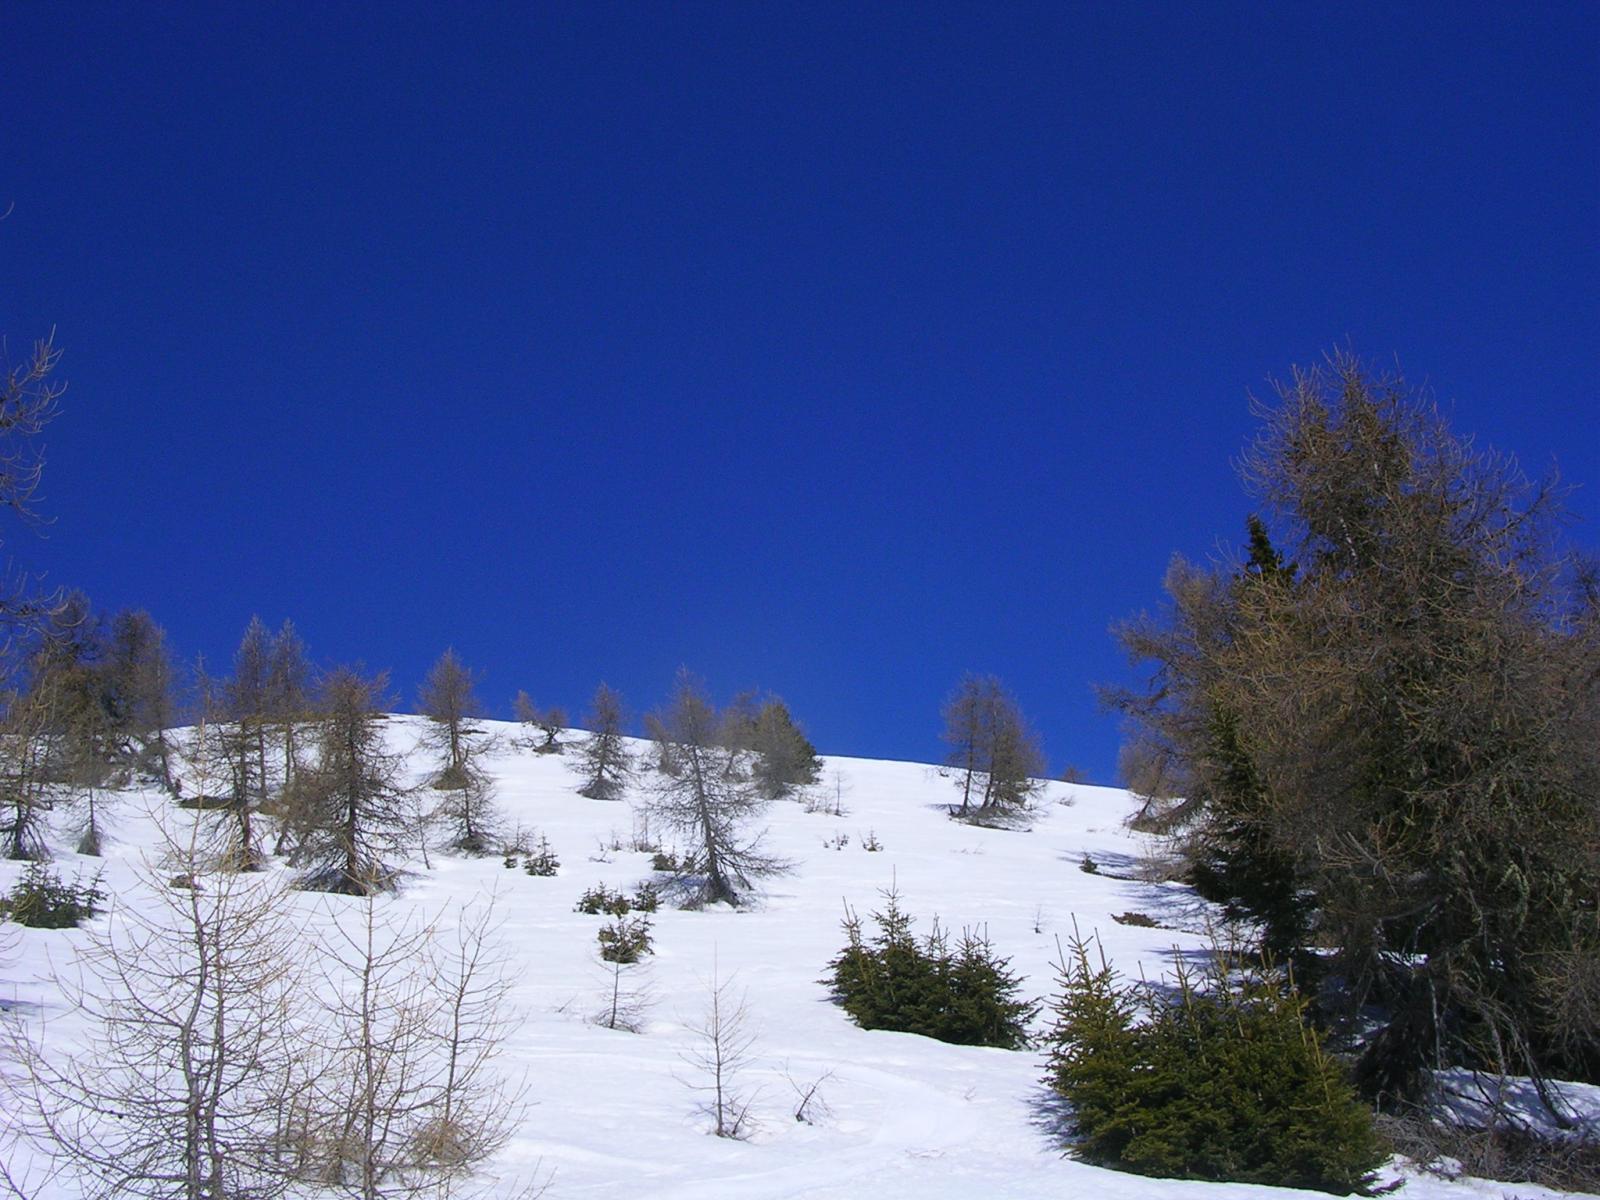 qui bella neve primaverile